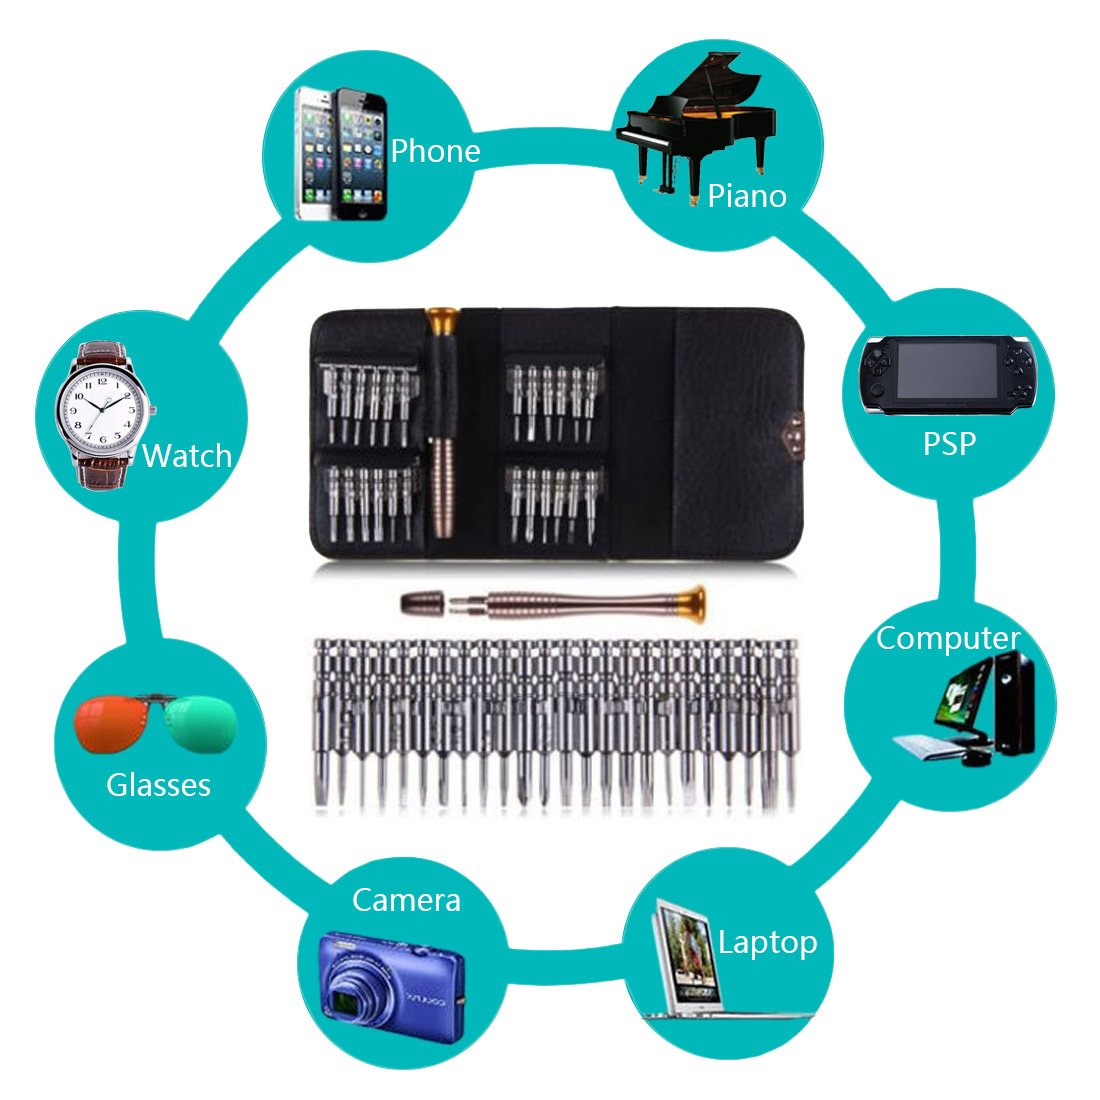 Купить с кэшбэком Screwdriver Set 25 in 1 Torx Multifunctional Opening Repair Tool Set Precision Screwdriver For Phones Tablet PC